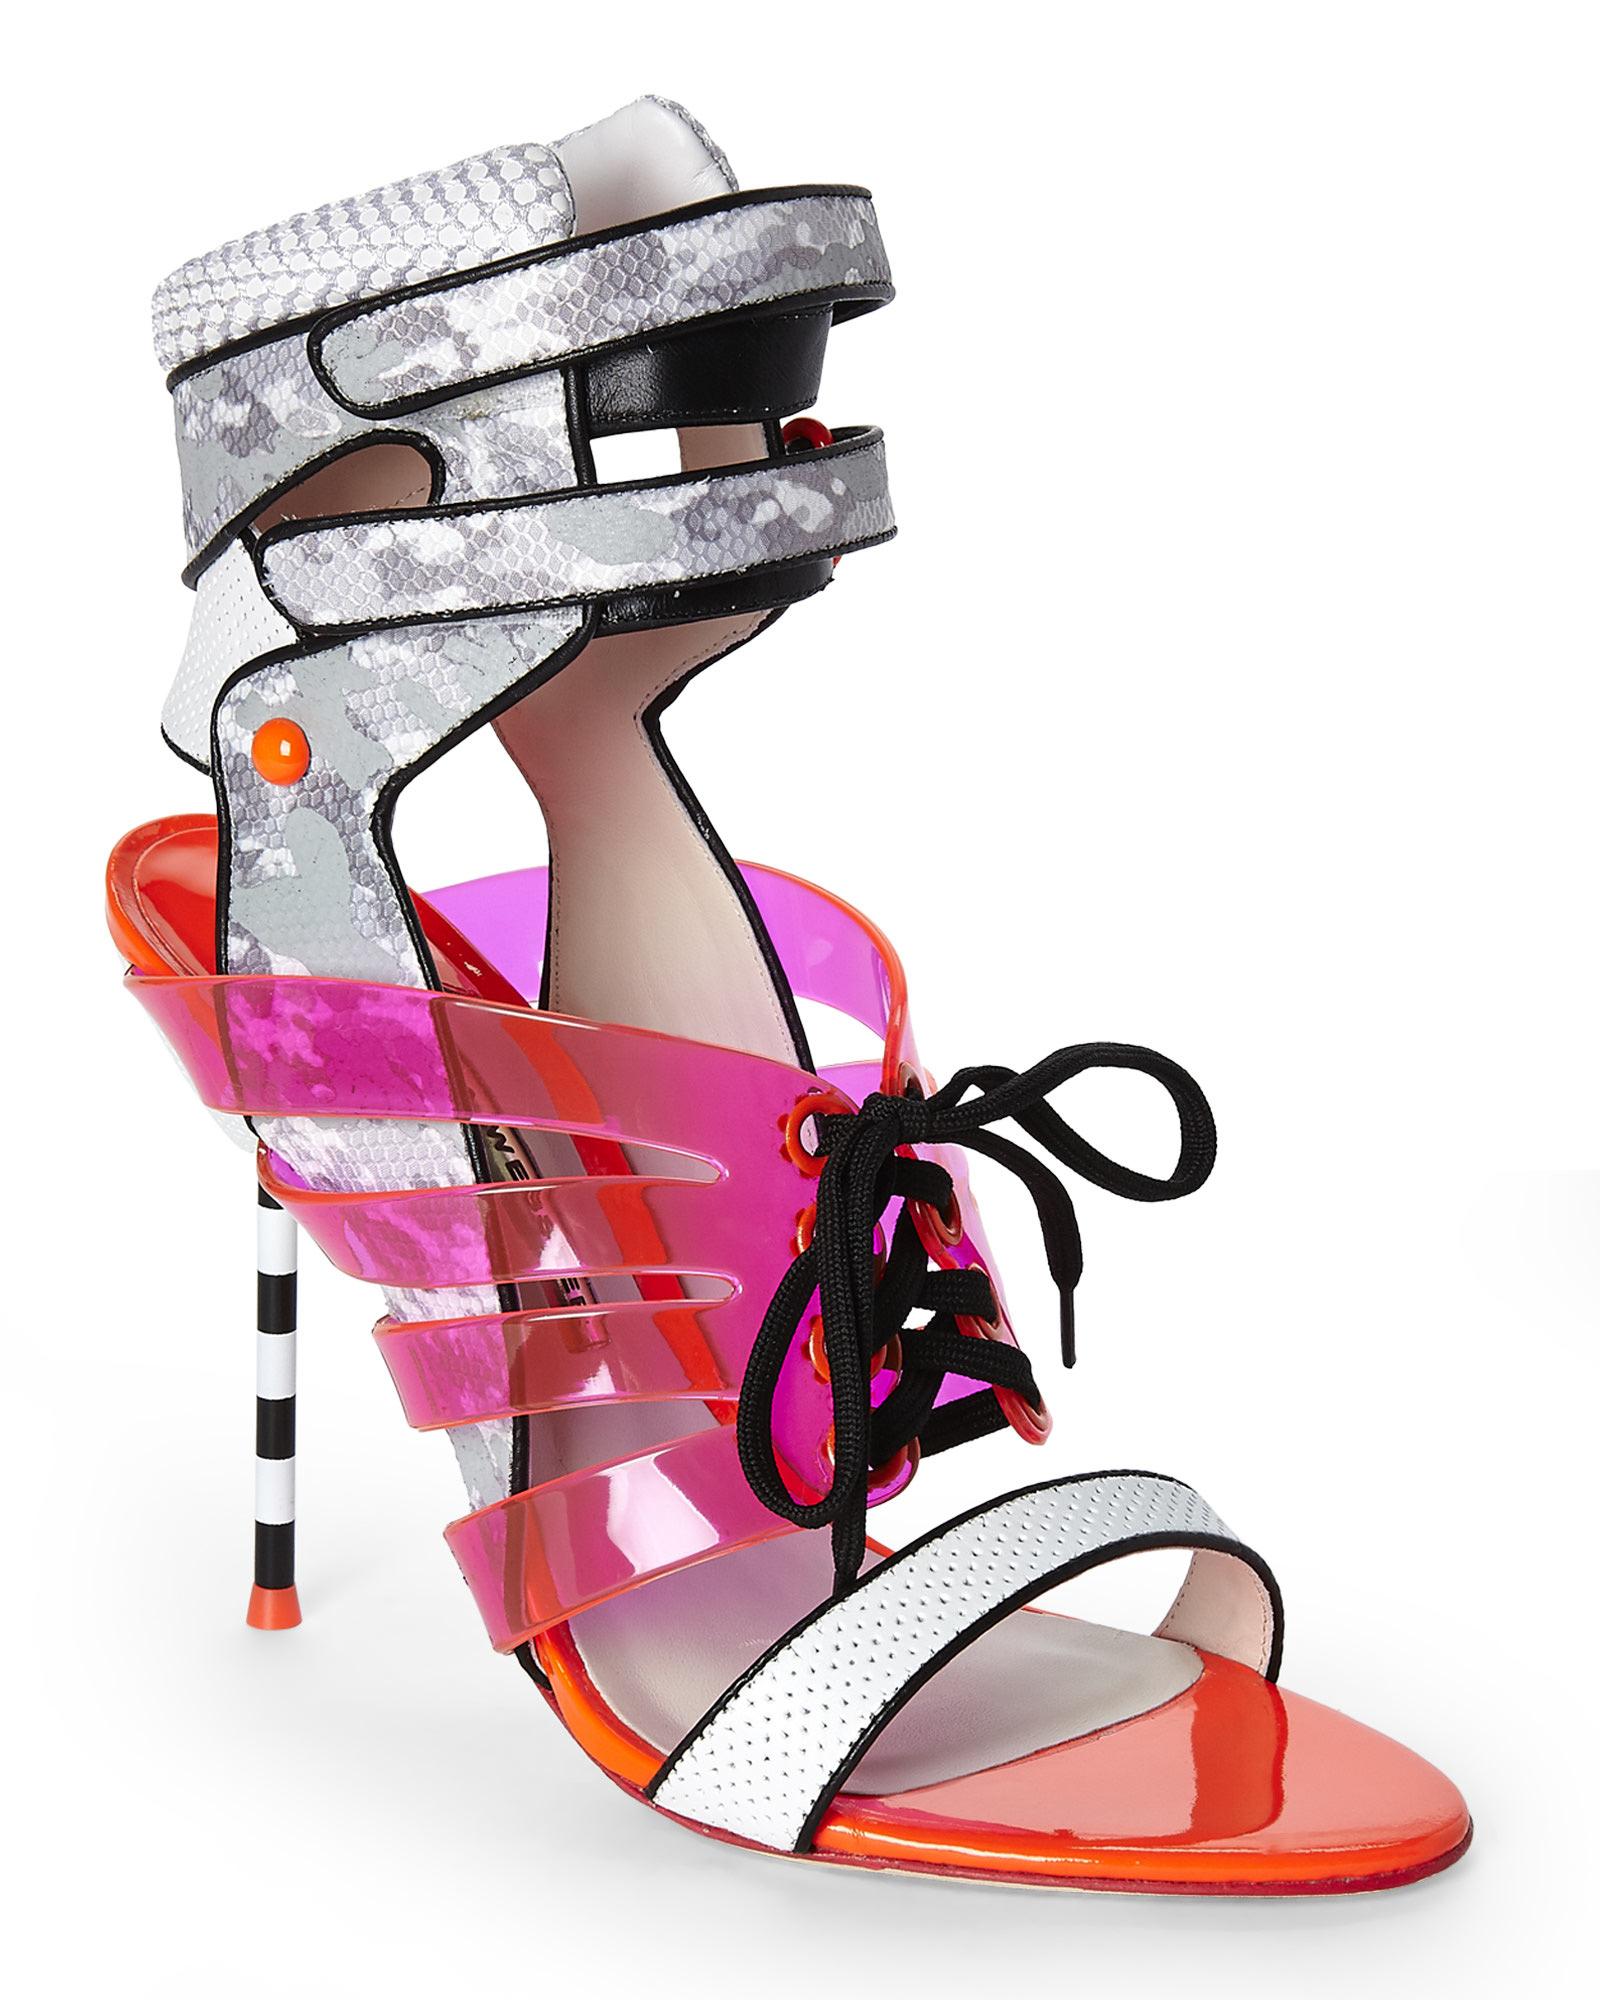 428bc7b2a2c3 Lyst - Sophia Webster Jourdan Jelly Lace-up Sandal in Gray